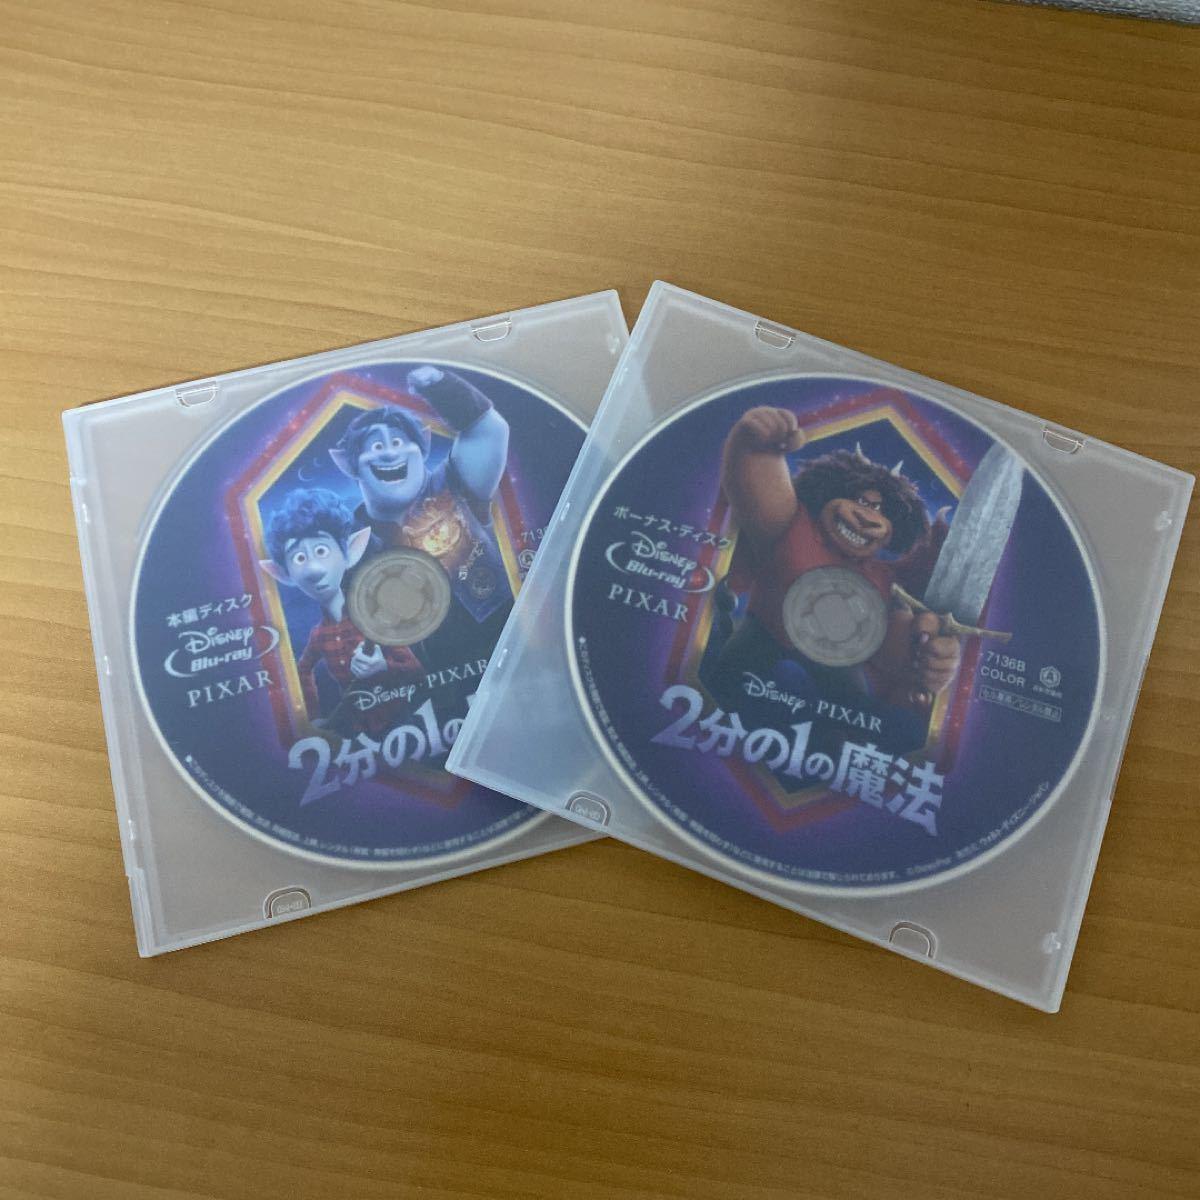 【Blu-ray】2分の1の魔法 ブルーレイ/本編ディスク&ボーナスディスク